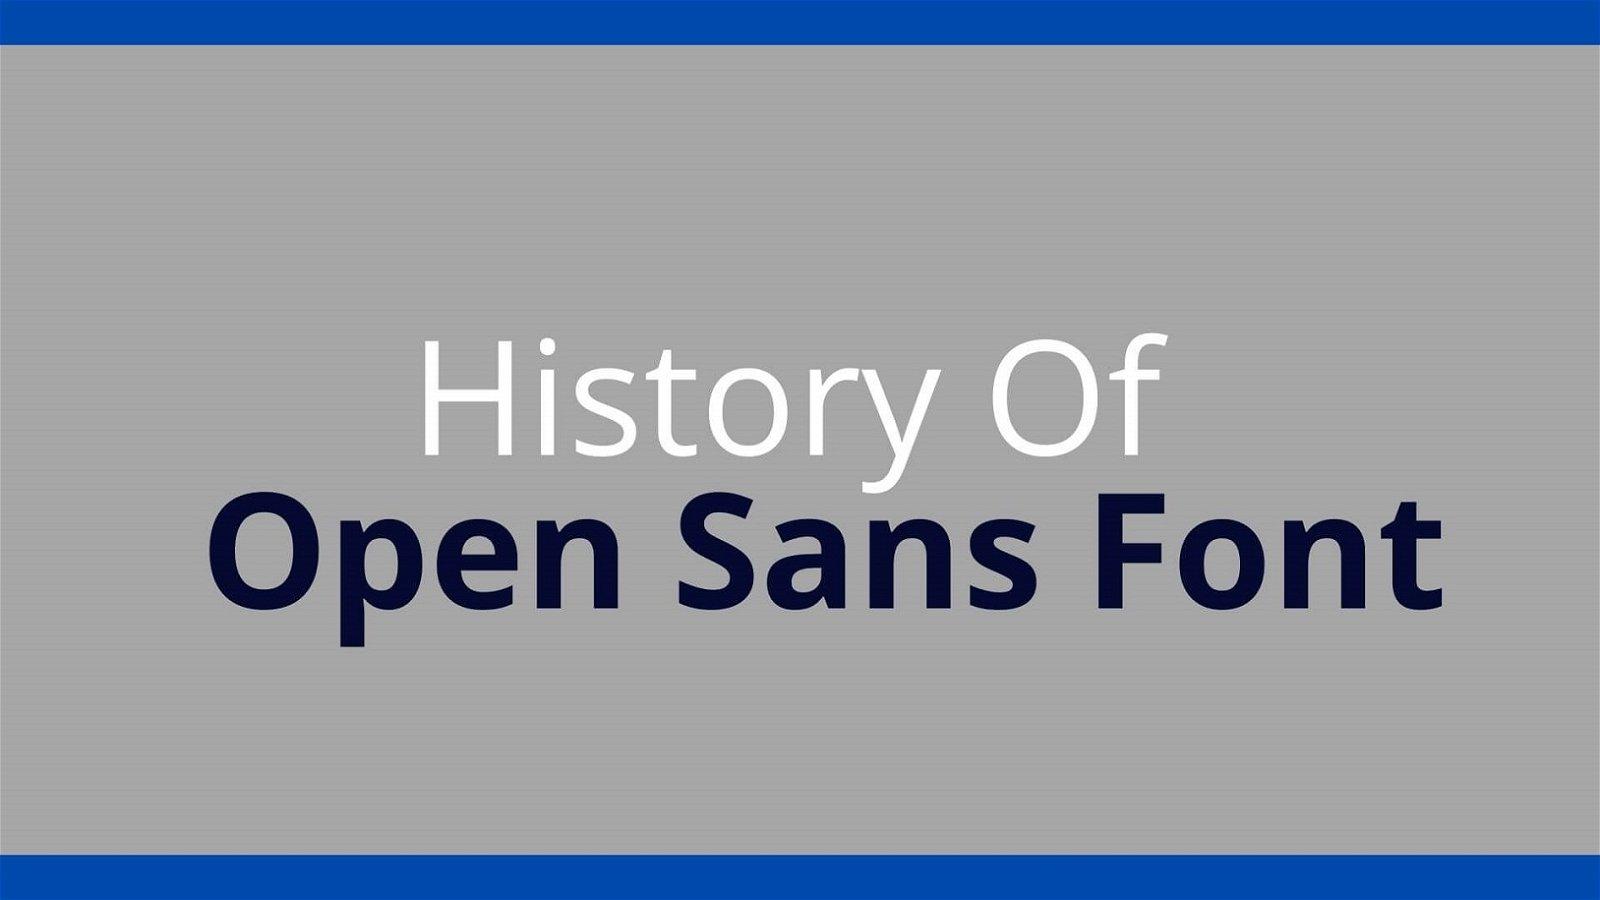 History of Open Sans Font